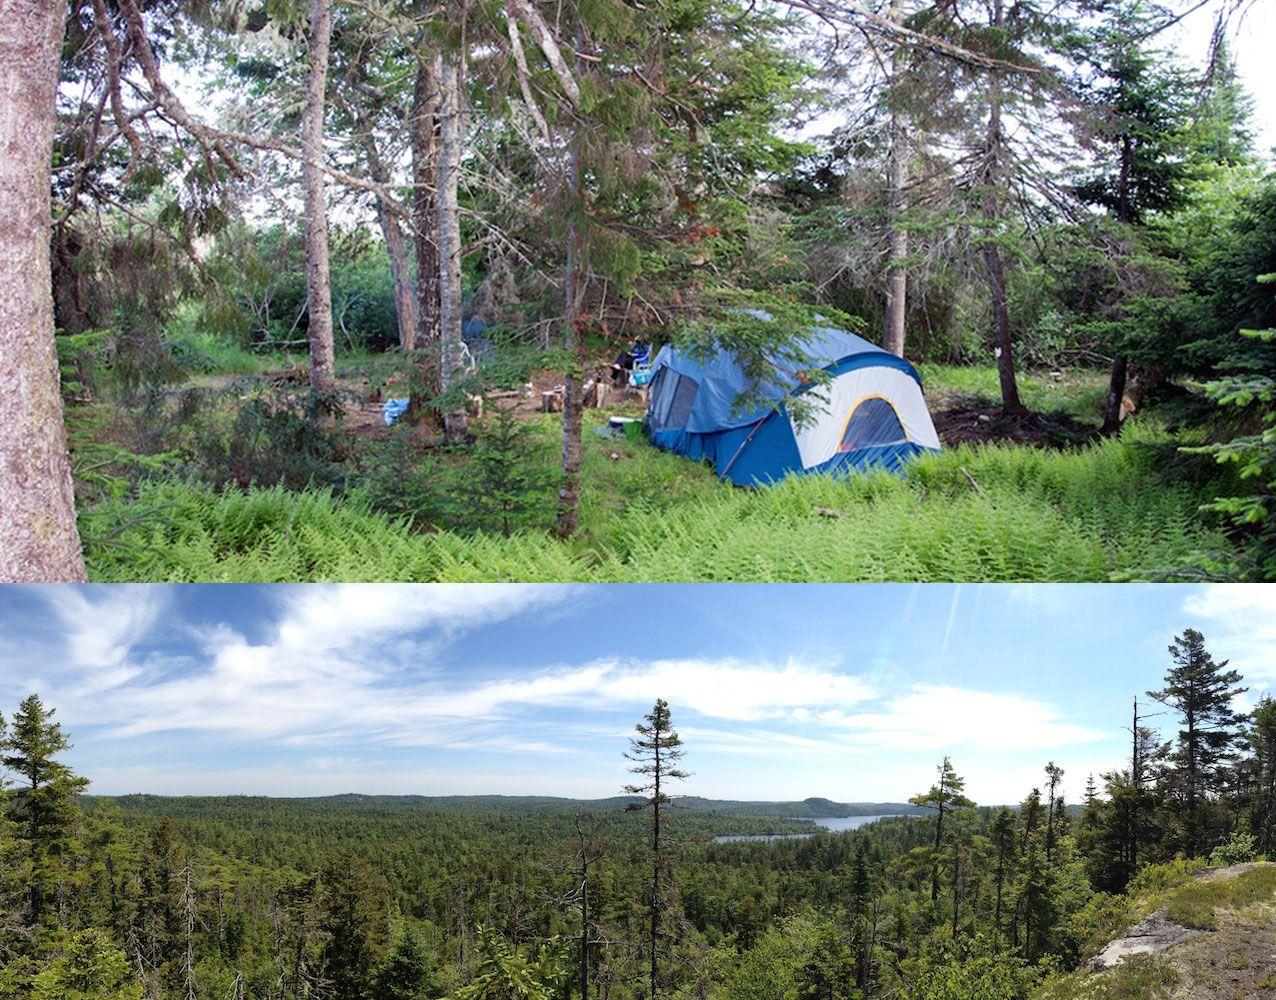 The River Island Wild Camp in Nova Scotia, Canada. The perfect adventure camping experience.